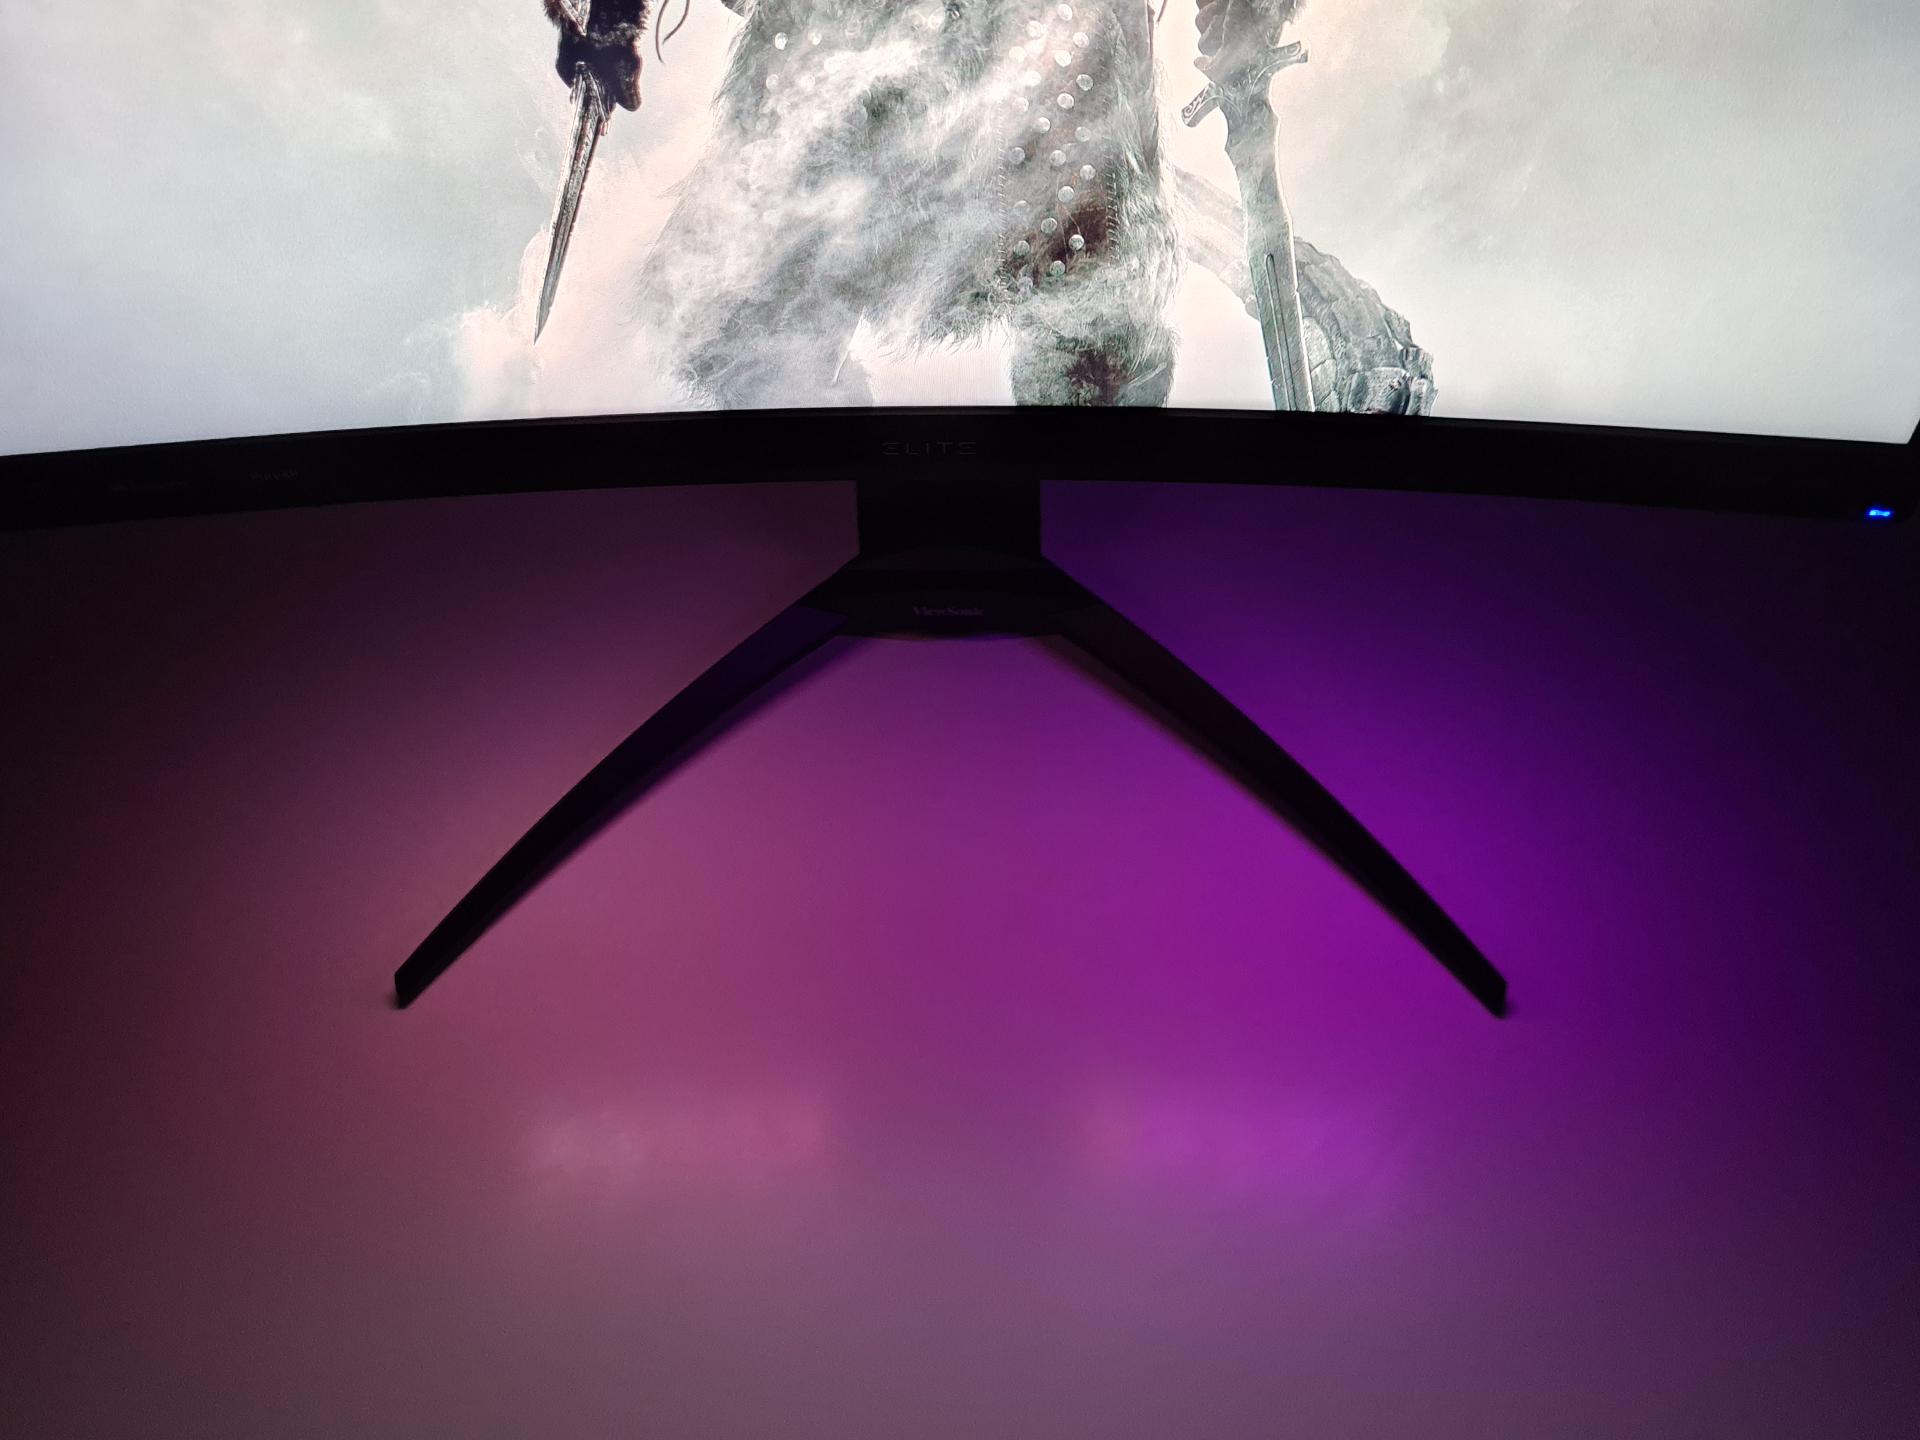 viewsonic xg270qc - LEDs